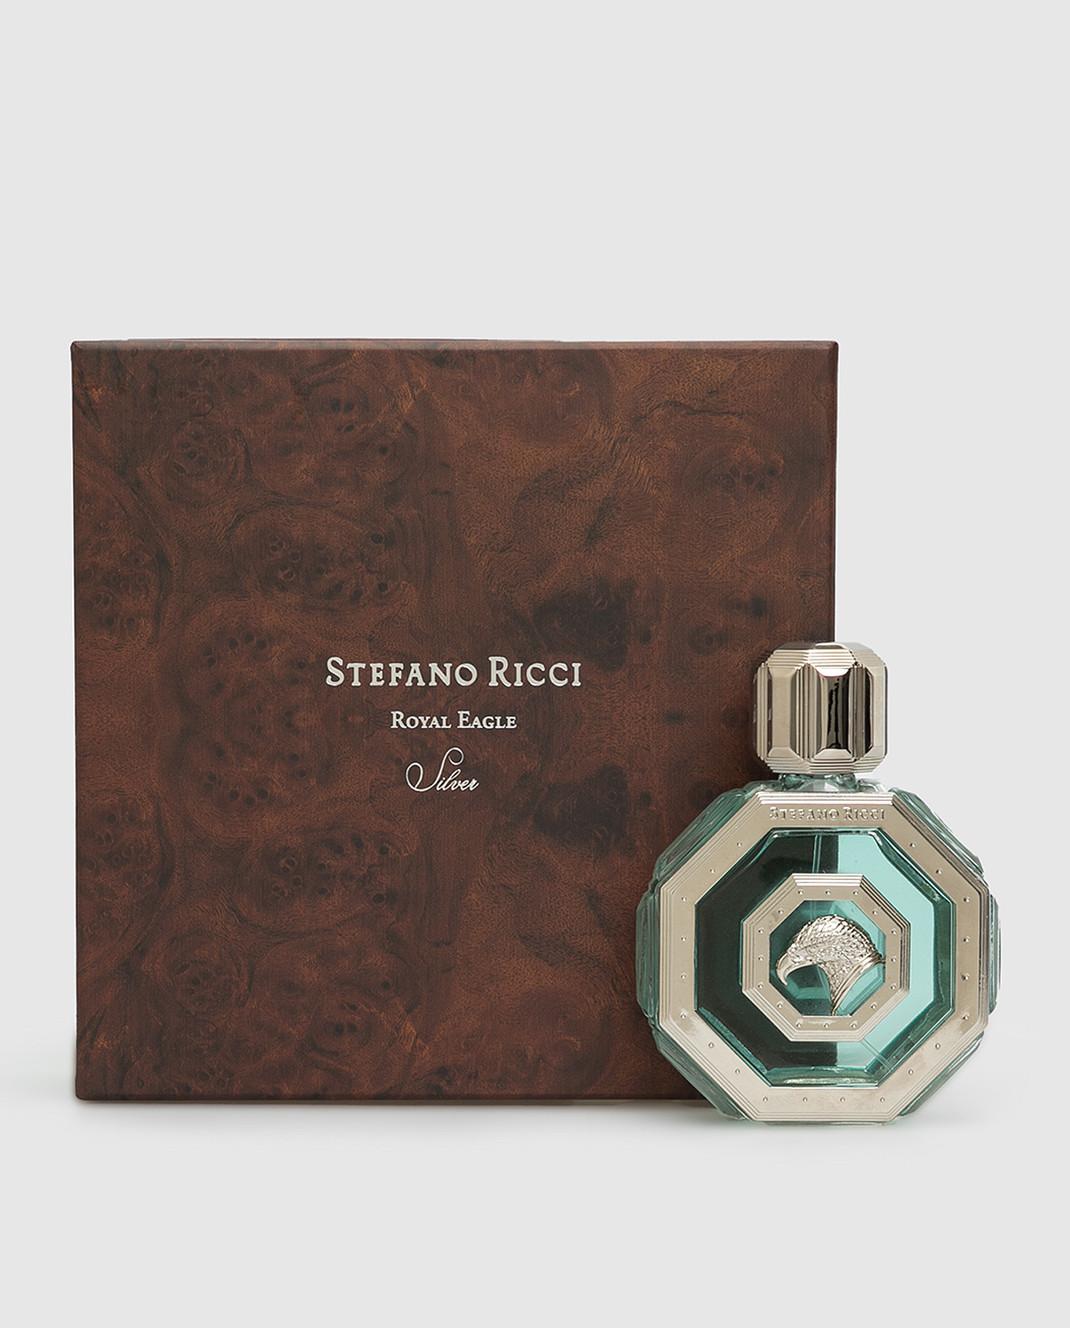 Stefano Ricci Парфюмированная вода Royal Eagle Silver 100 мл изображение 5